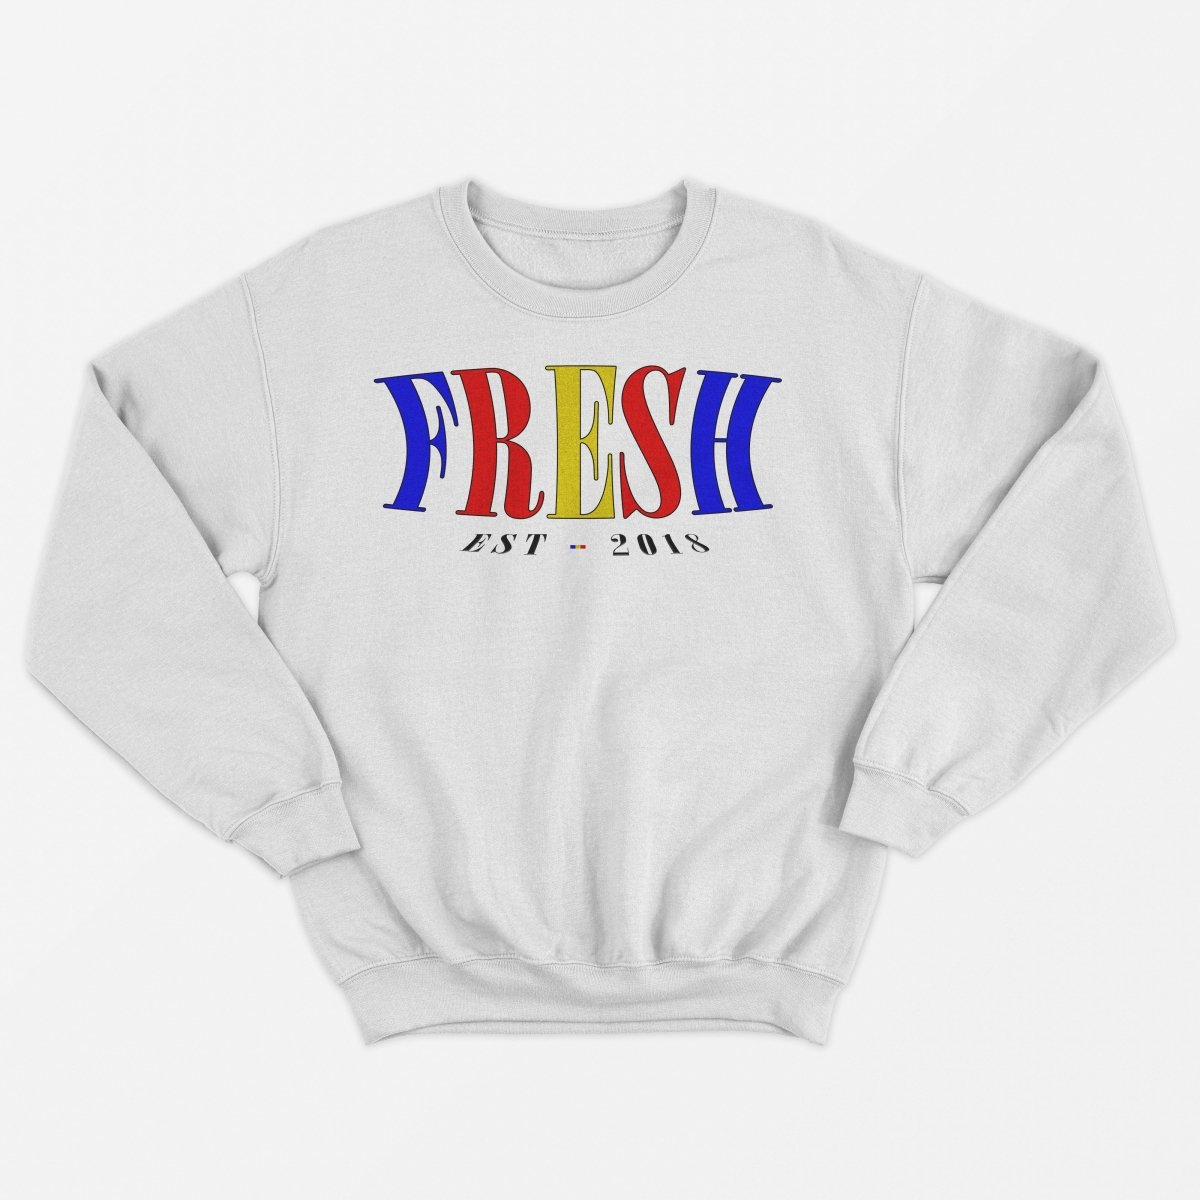 FRESH - Since 2018 Unisex Sweater